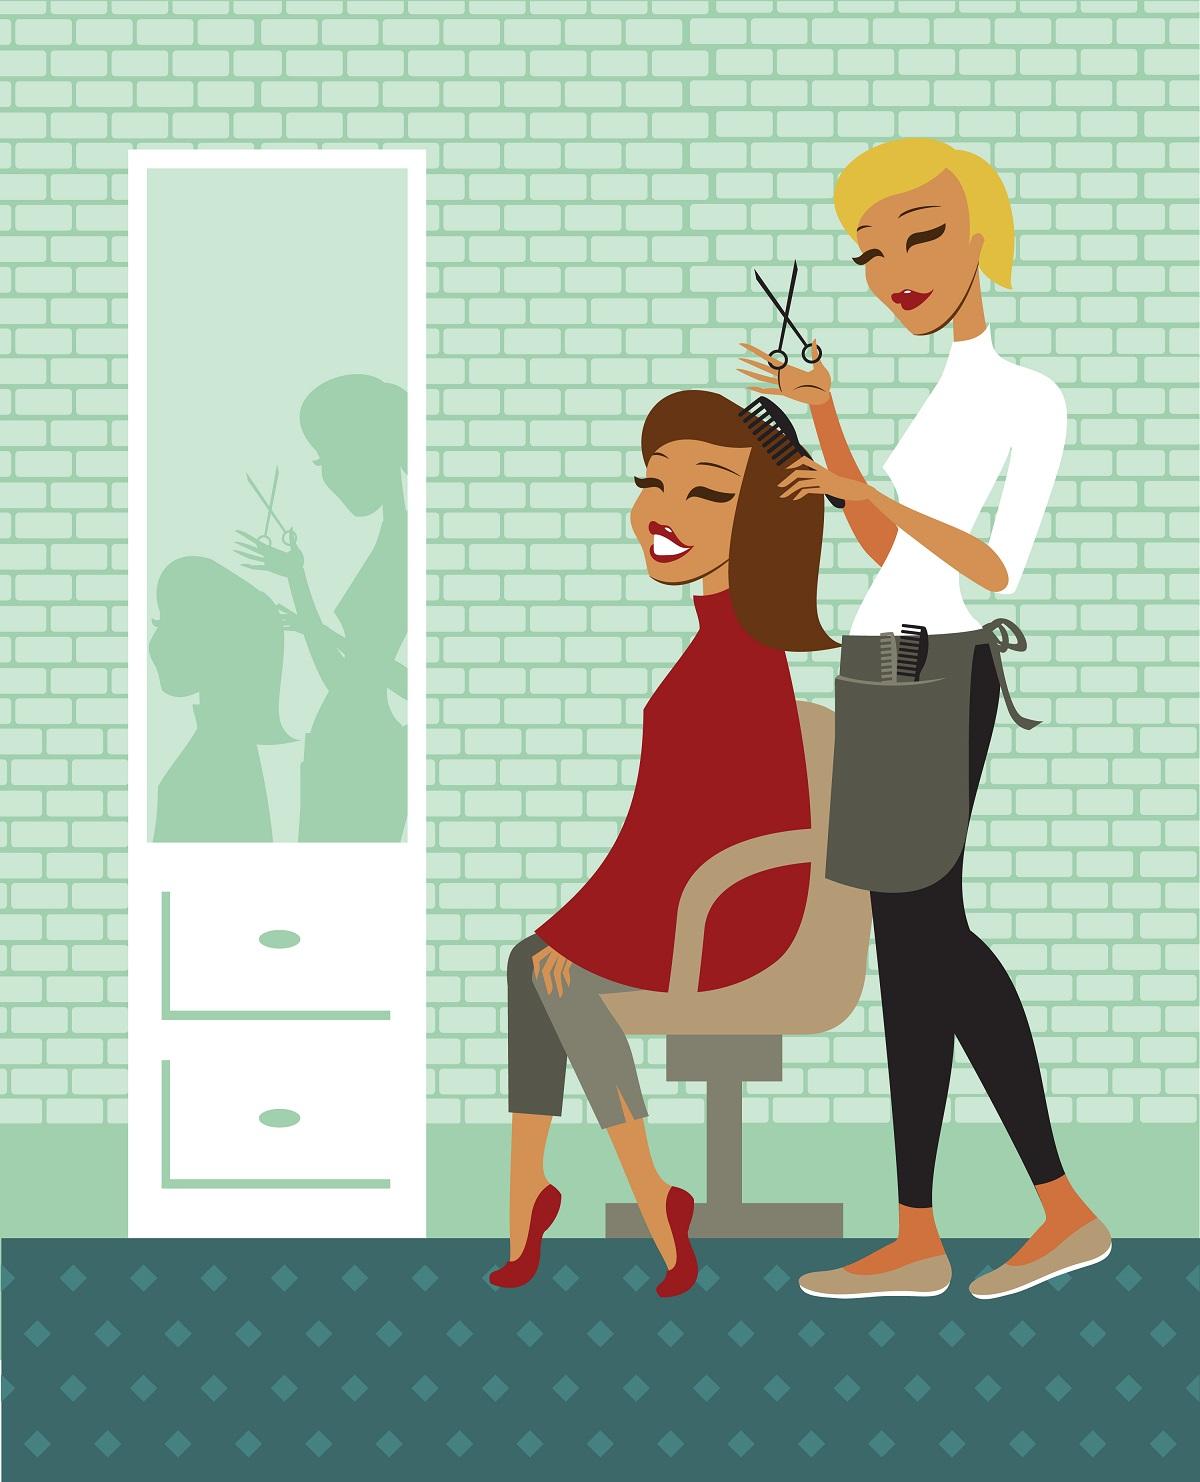 8. Trim your hair